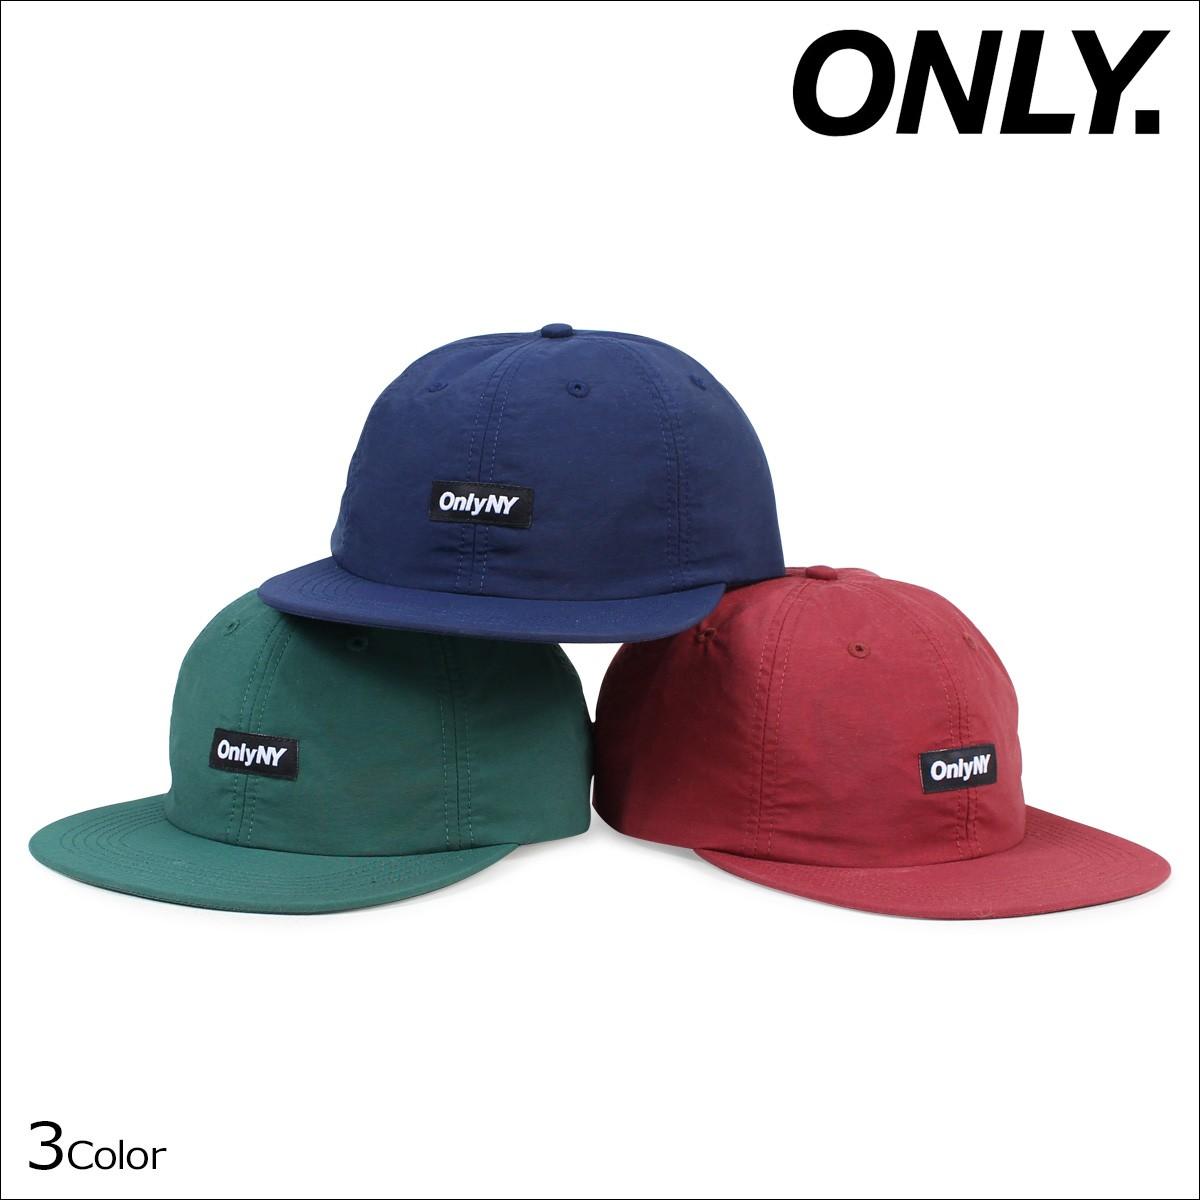 ONLY NY オンリーニューヨーク キャップ 帽子 メンズ レディース TECH POLO HAT ストラップバック ナイロン [12/22 新入荷]